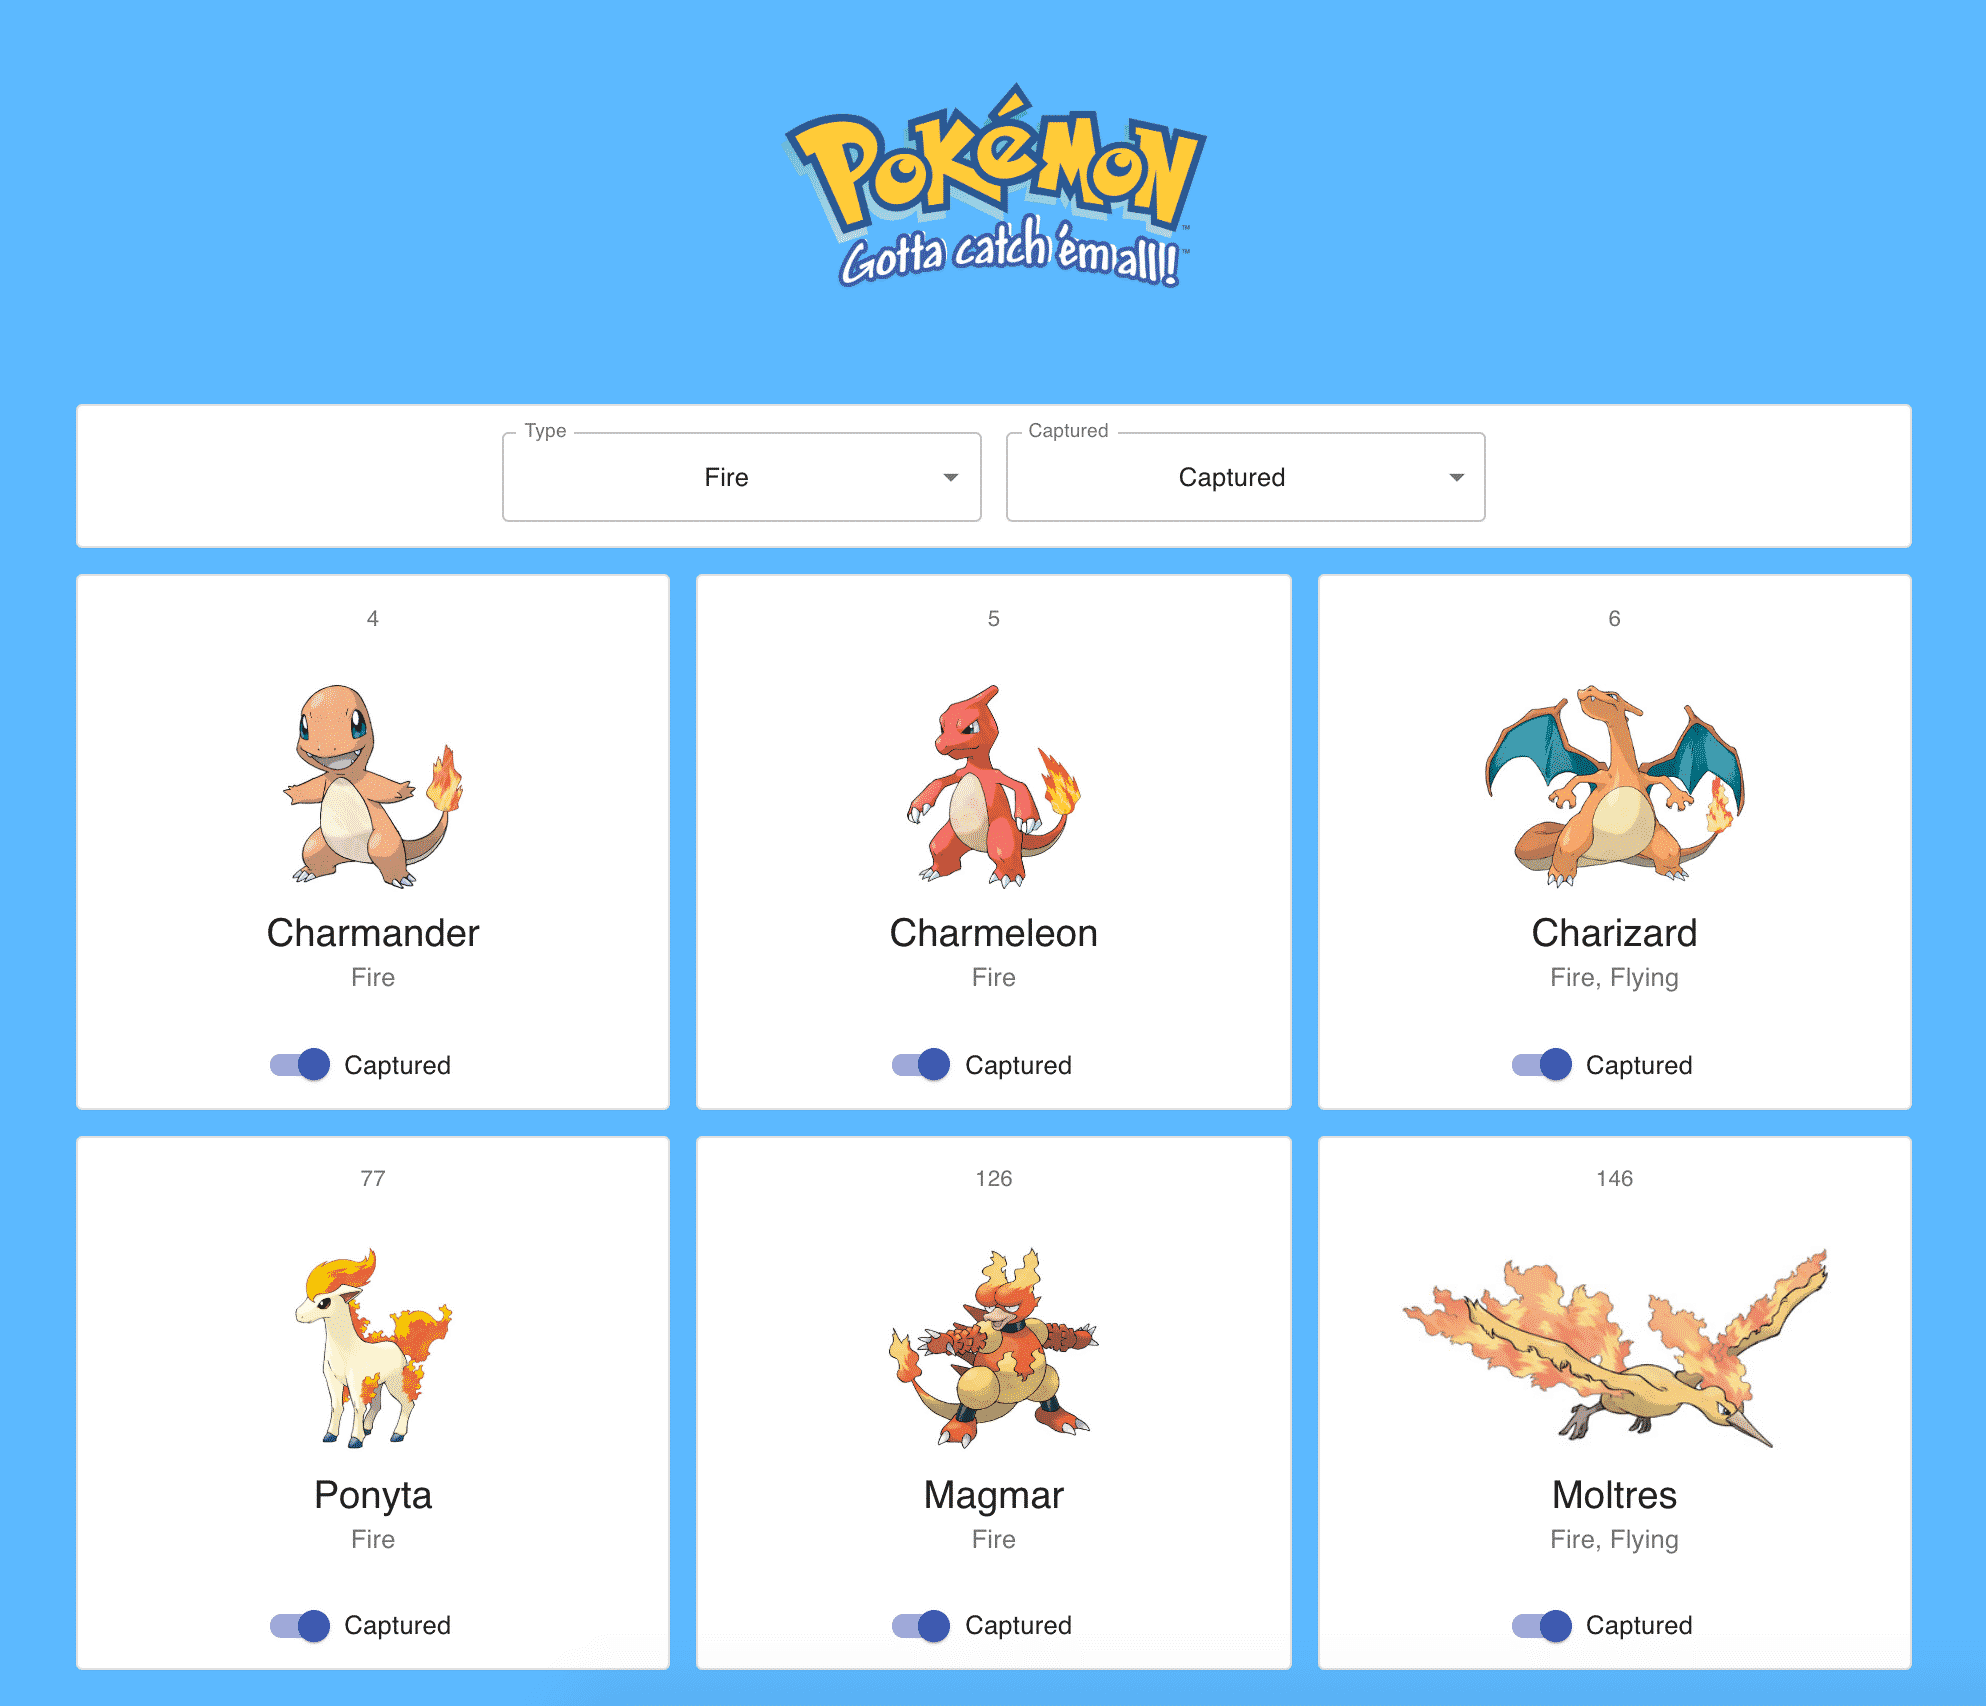 Captured Fire-type Pokémon